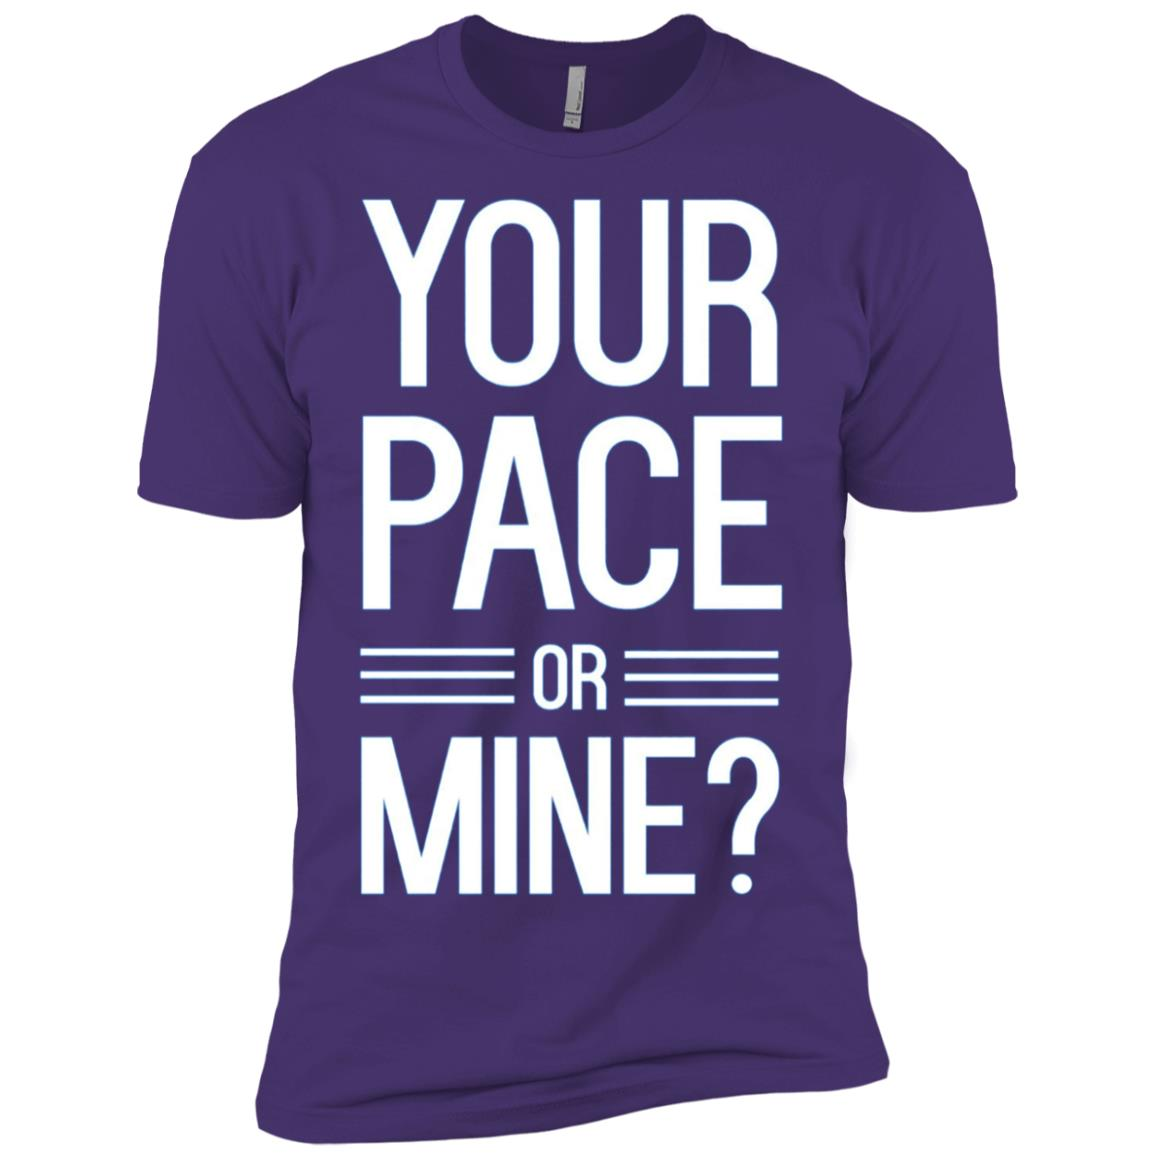 Your pace or mine runner Men Short Sleeve T-Shirt